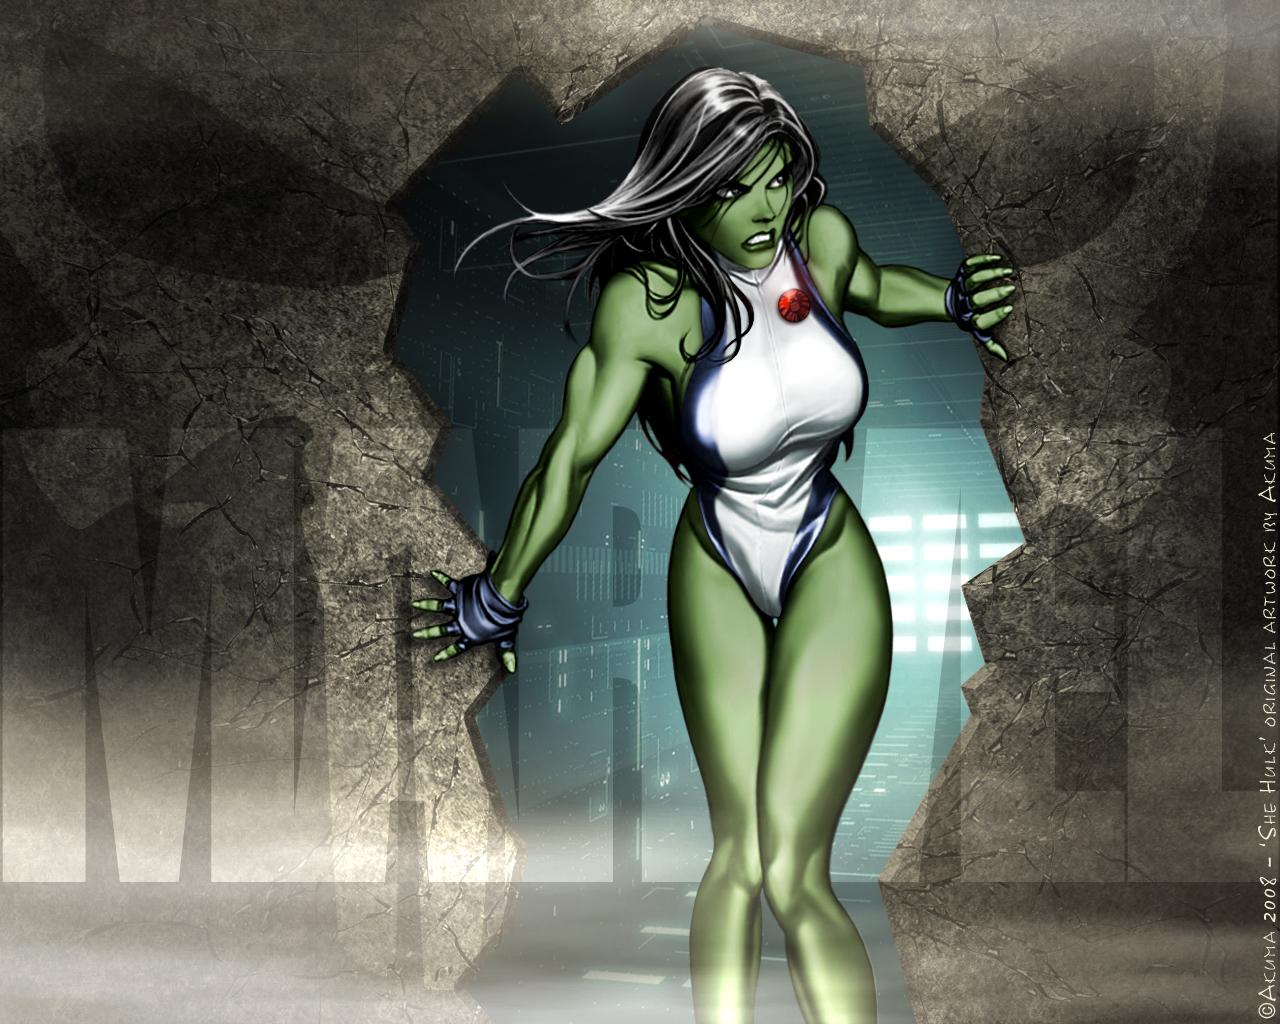 Wallpapers Comics Civil War CIVIL WAR: Miss Hulk in Search & Destroy mode